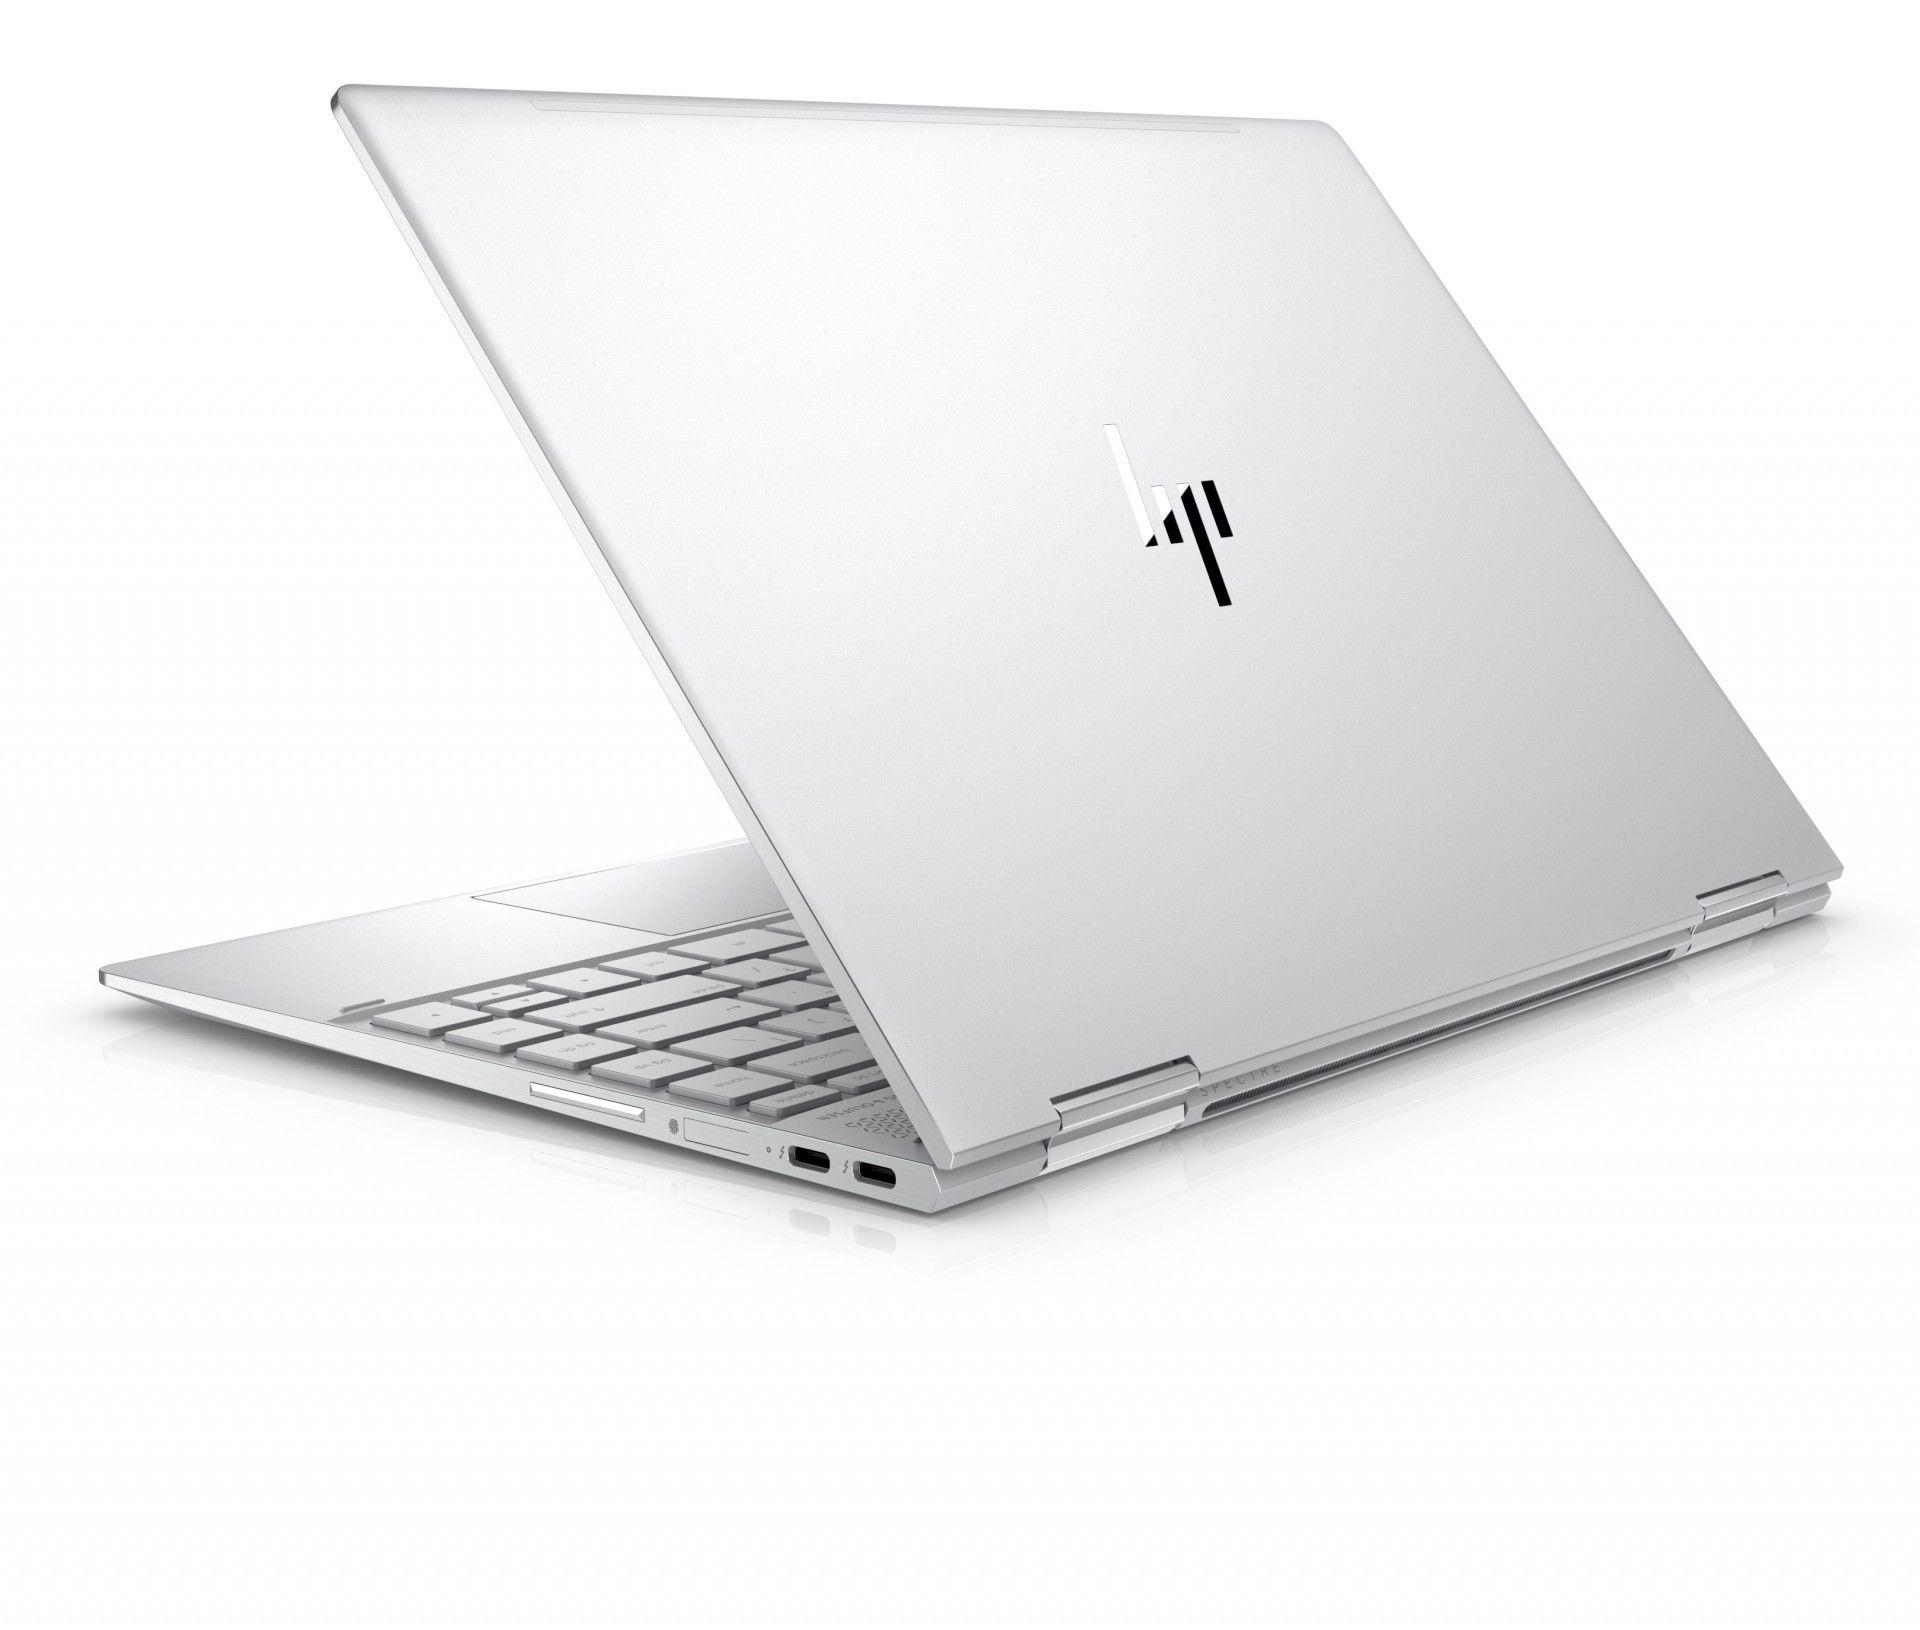 HP Spectre x360 13-ae002nw 2WA13EAR